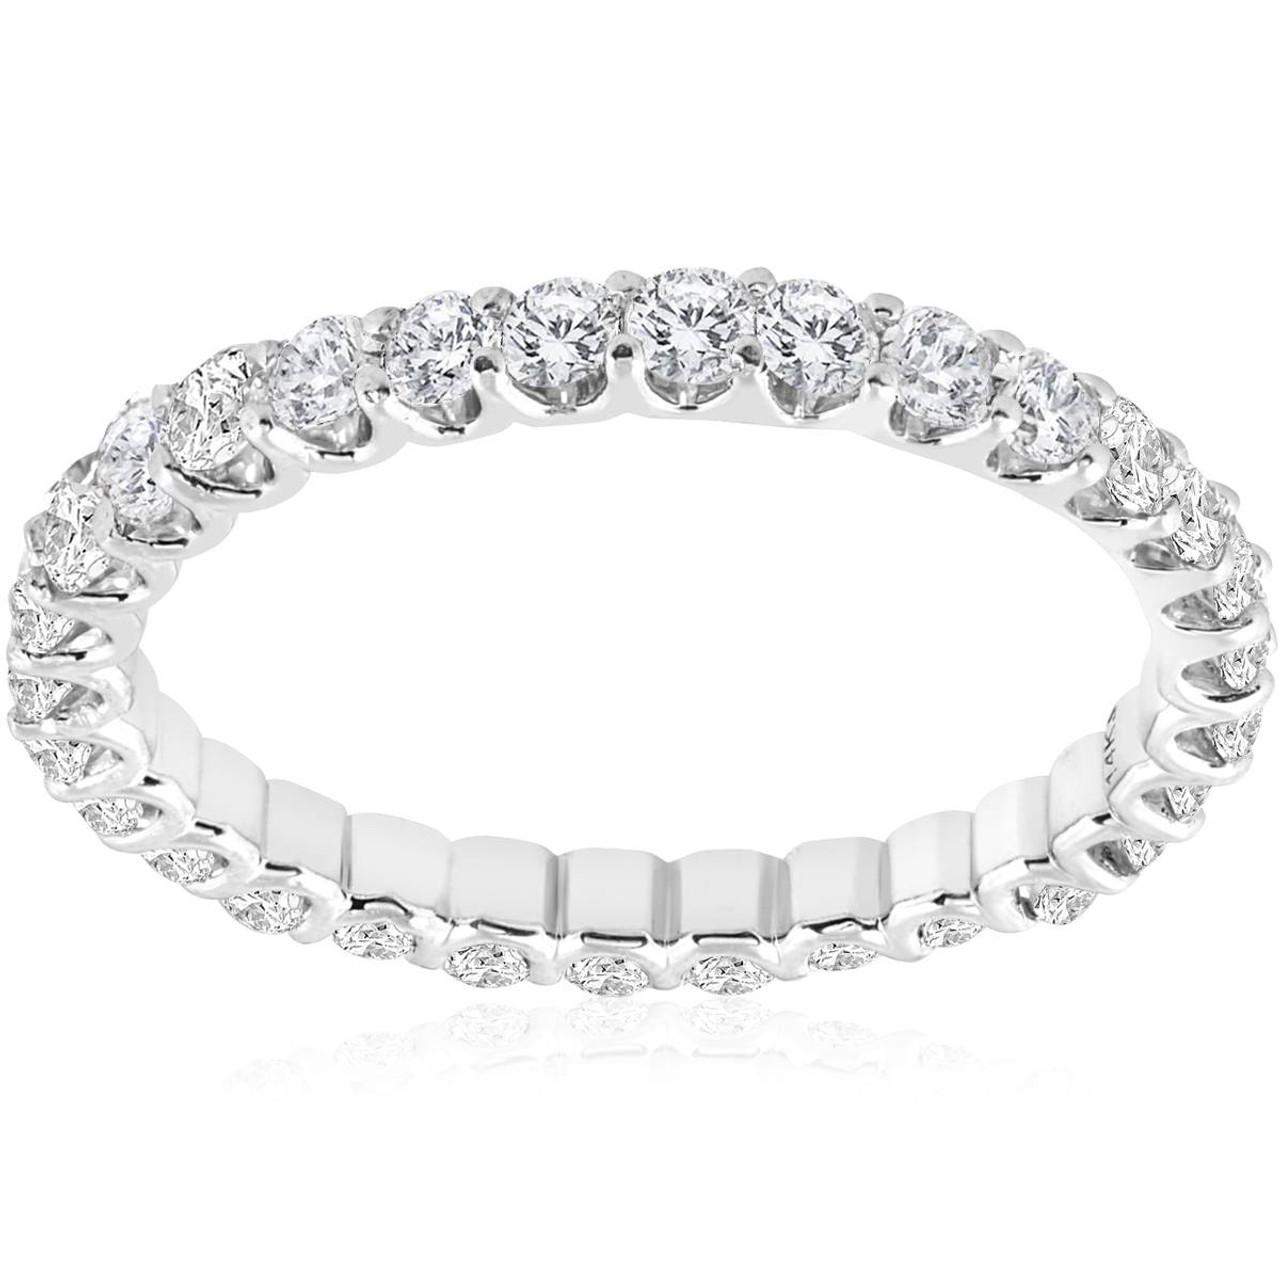 8fdb172eb14 1 1 2 cttw Diamond Eternity Ring U Prong 14k White Gold Wedding Band